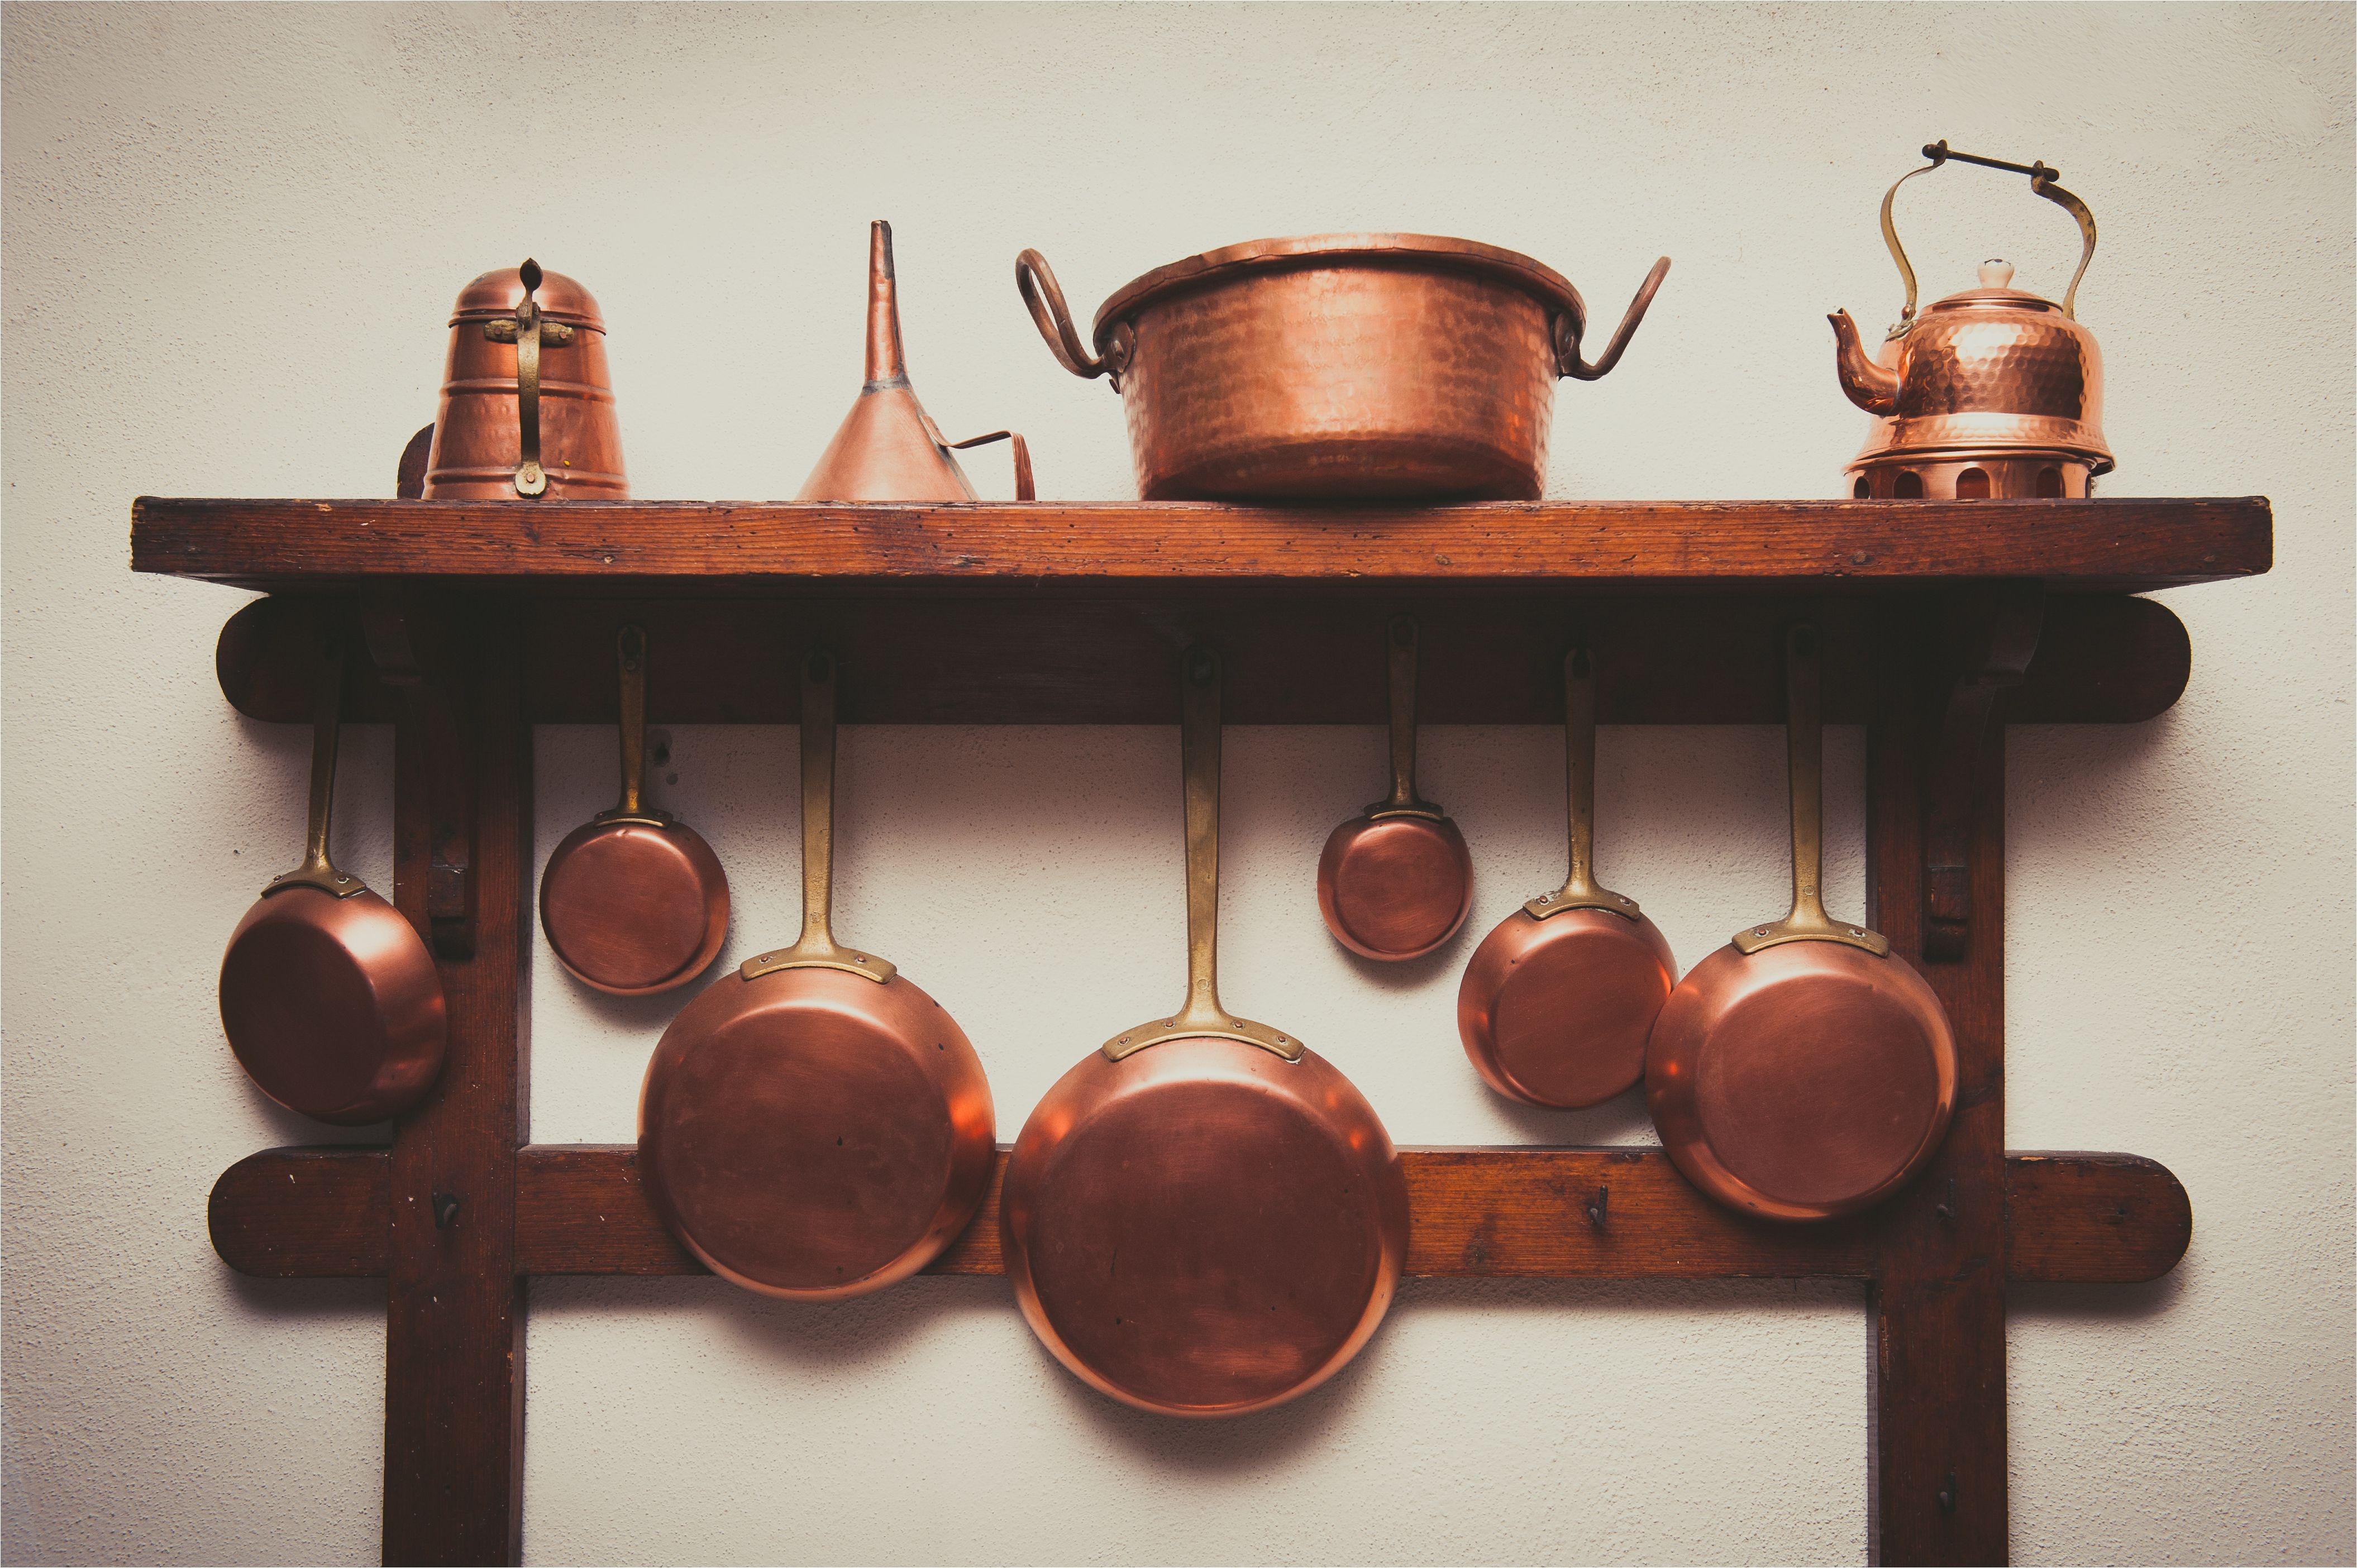 Small Decorative Copper Pots 3 Ways to Remove Lacquer From Copper Cookware and Decor